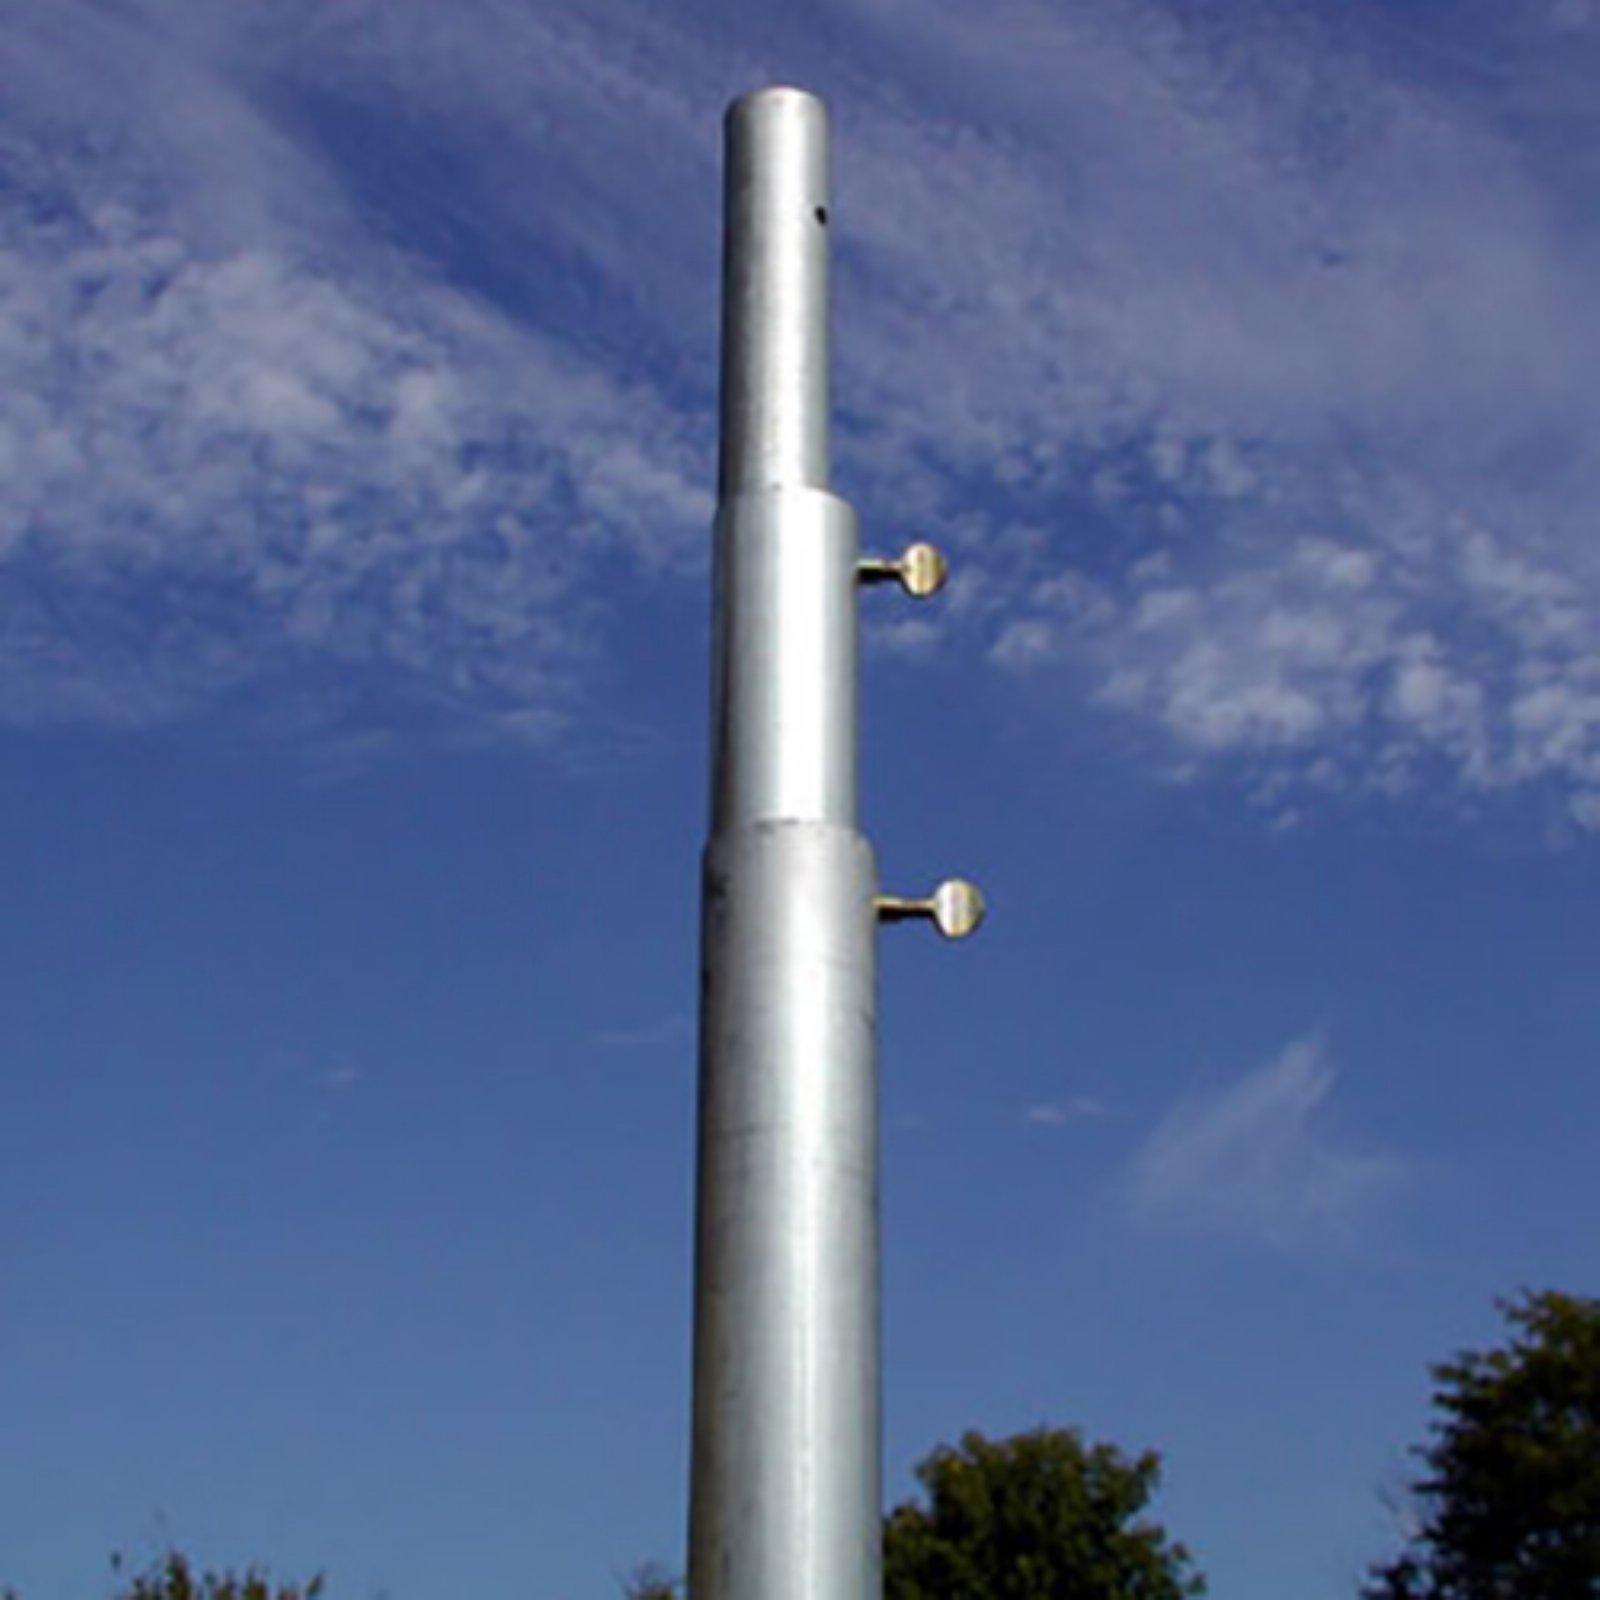 Birds Choice Heavy Duty 3-Section Telescoping Pole